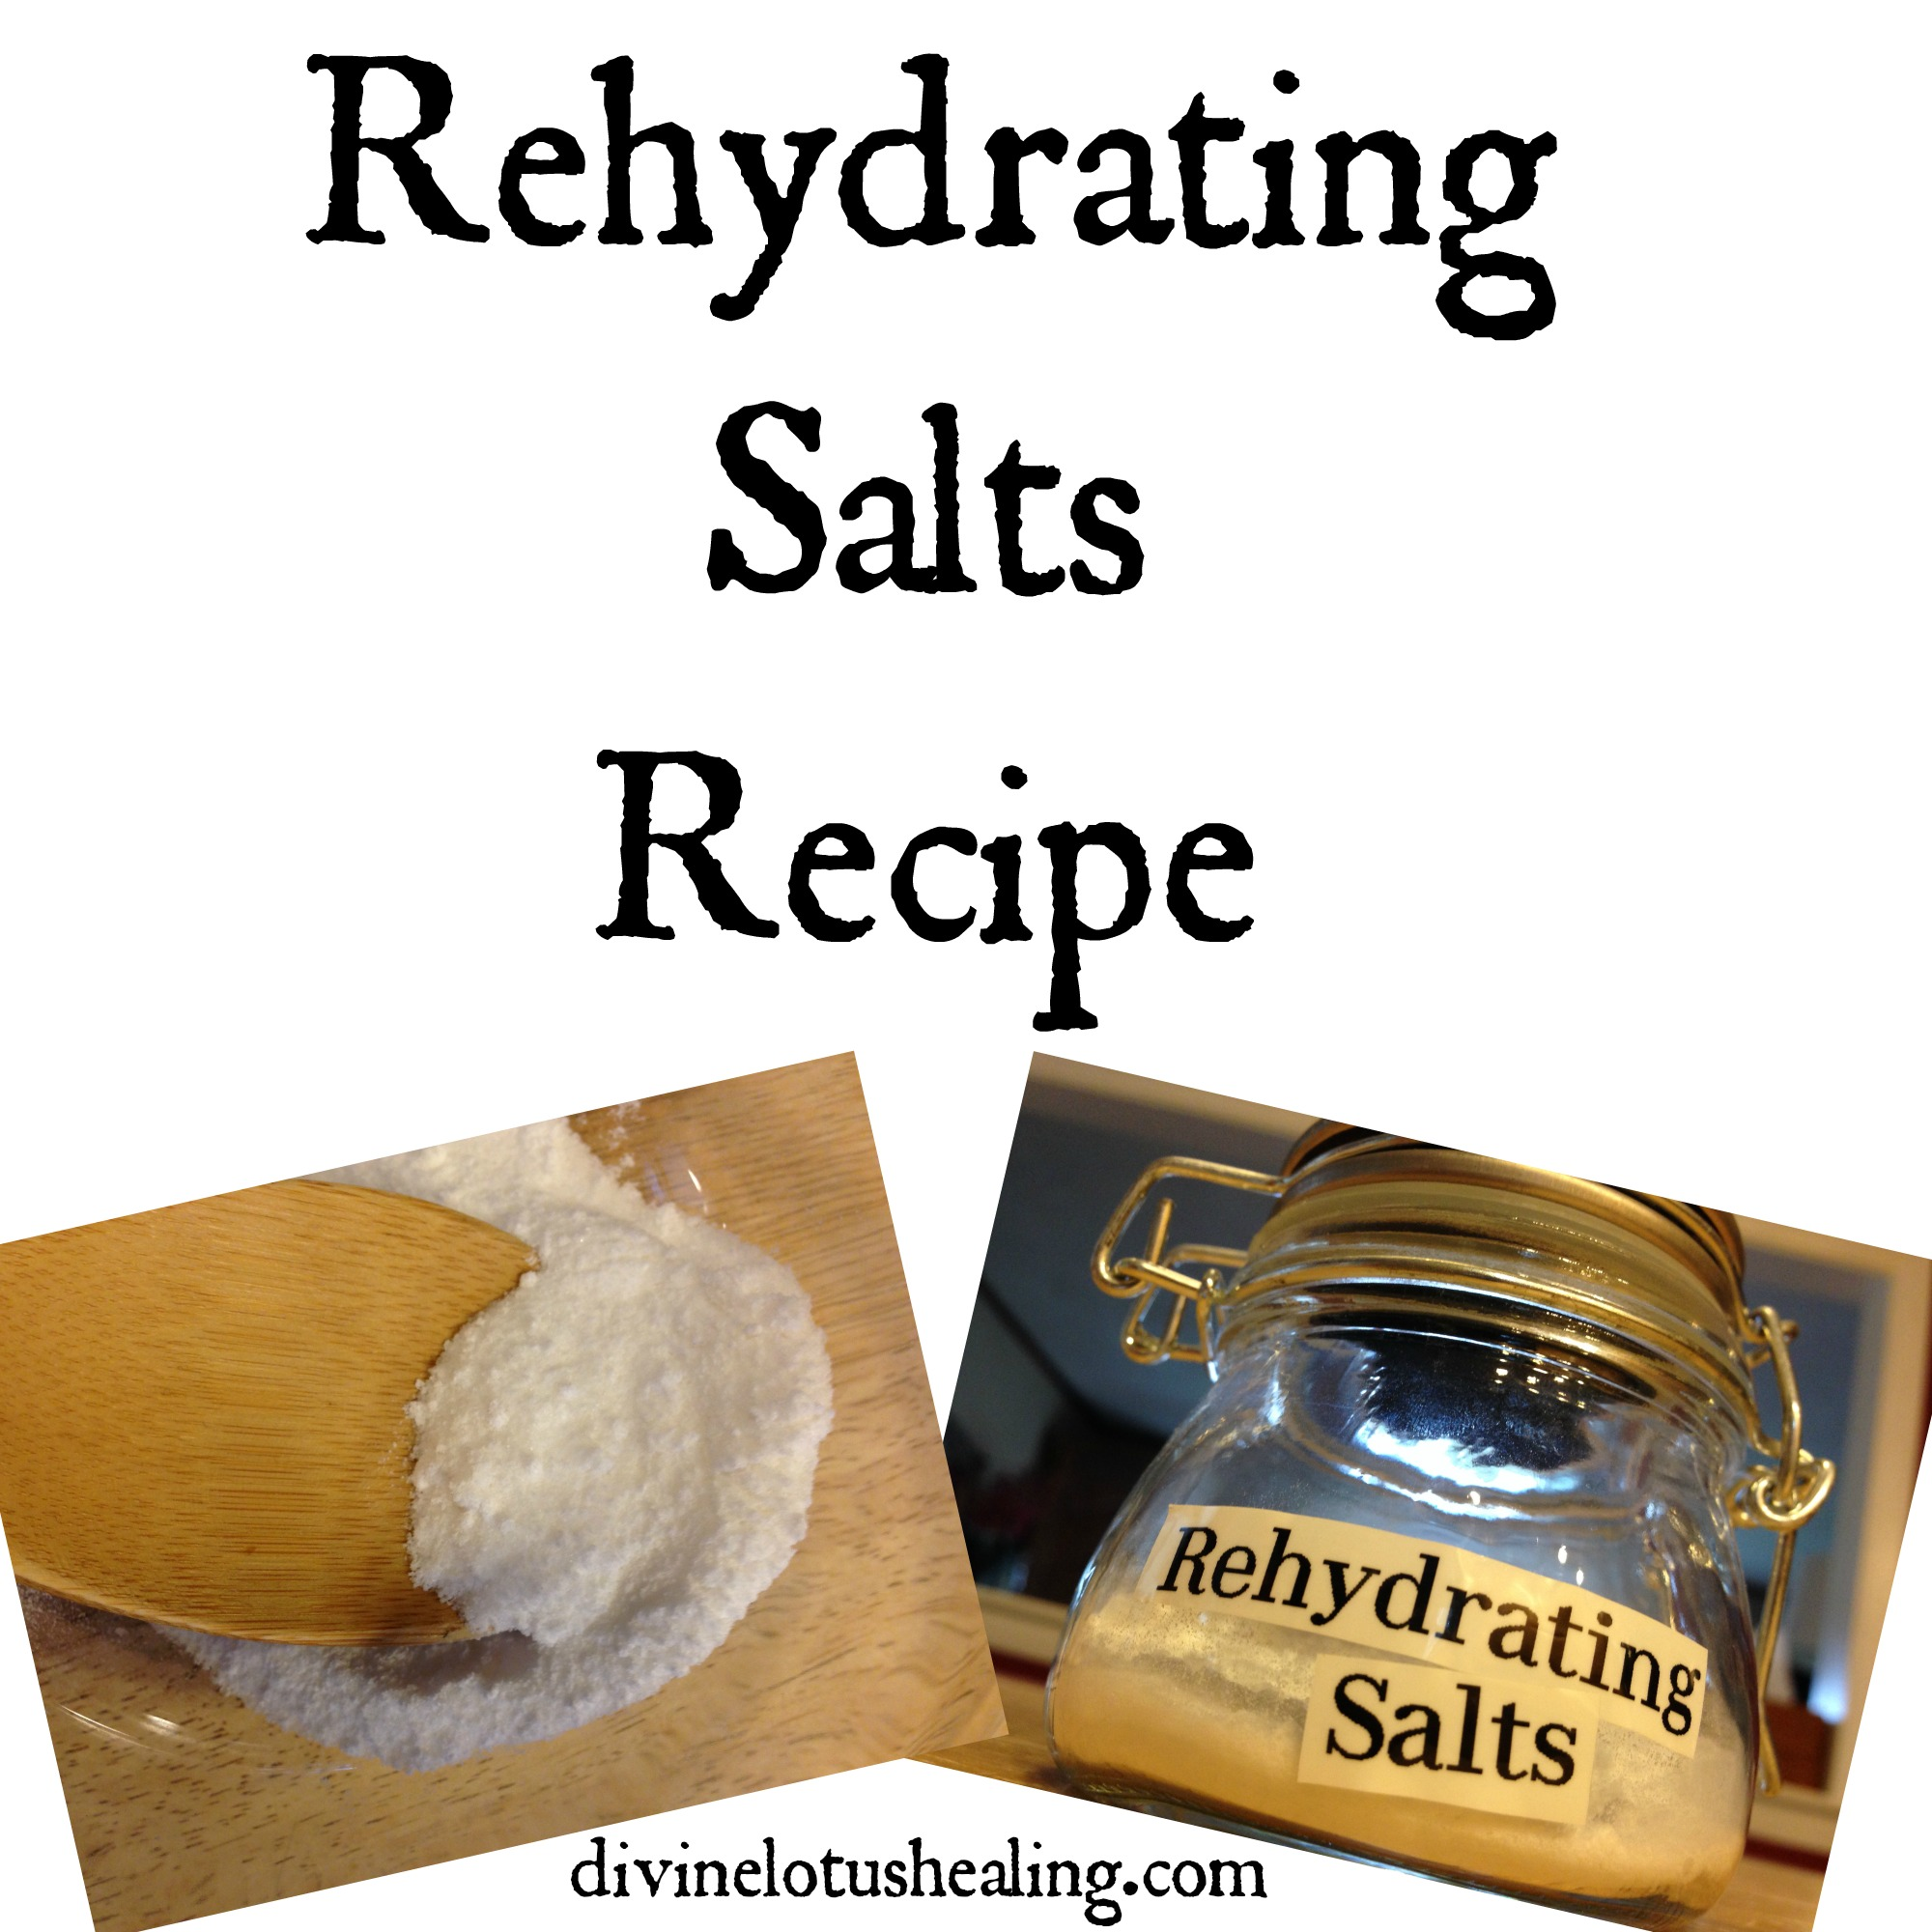 Rehydration Salts Recipe